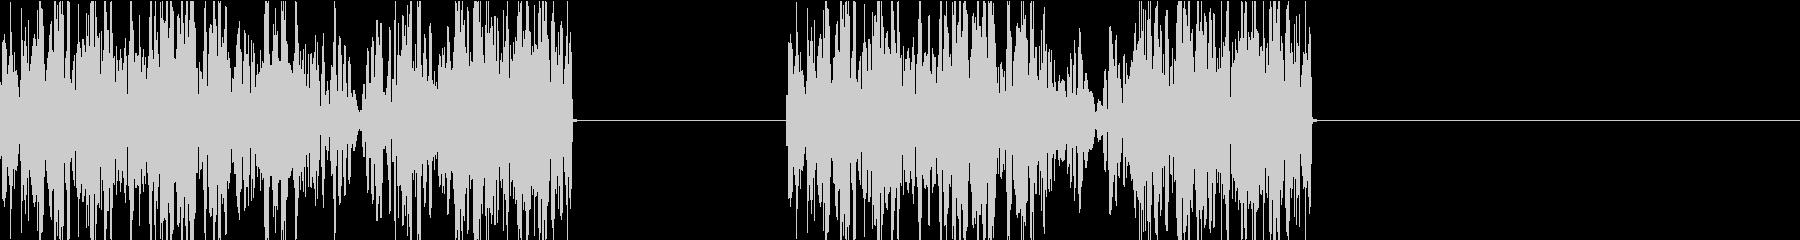 DJプレイ スクラッチ・ノイズ 150の未再生の波形